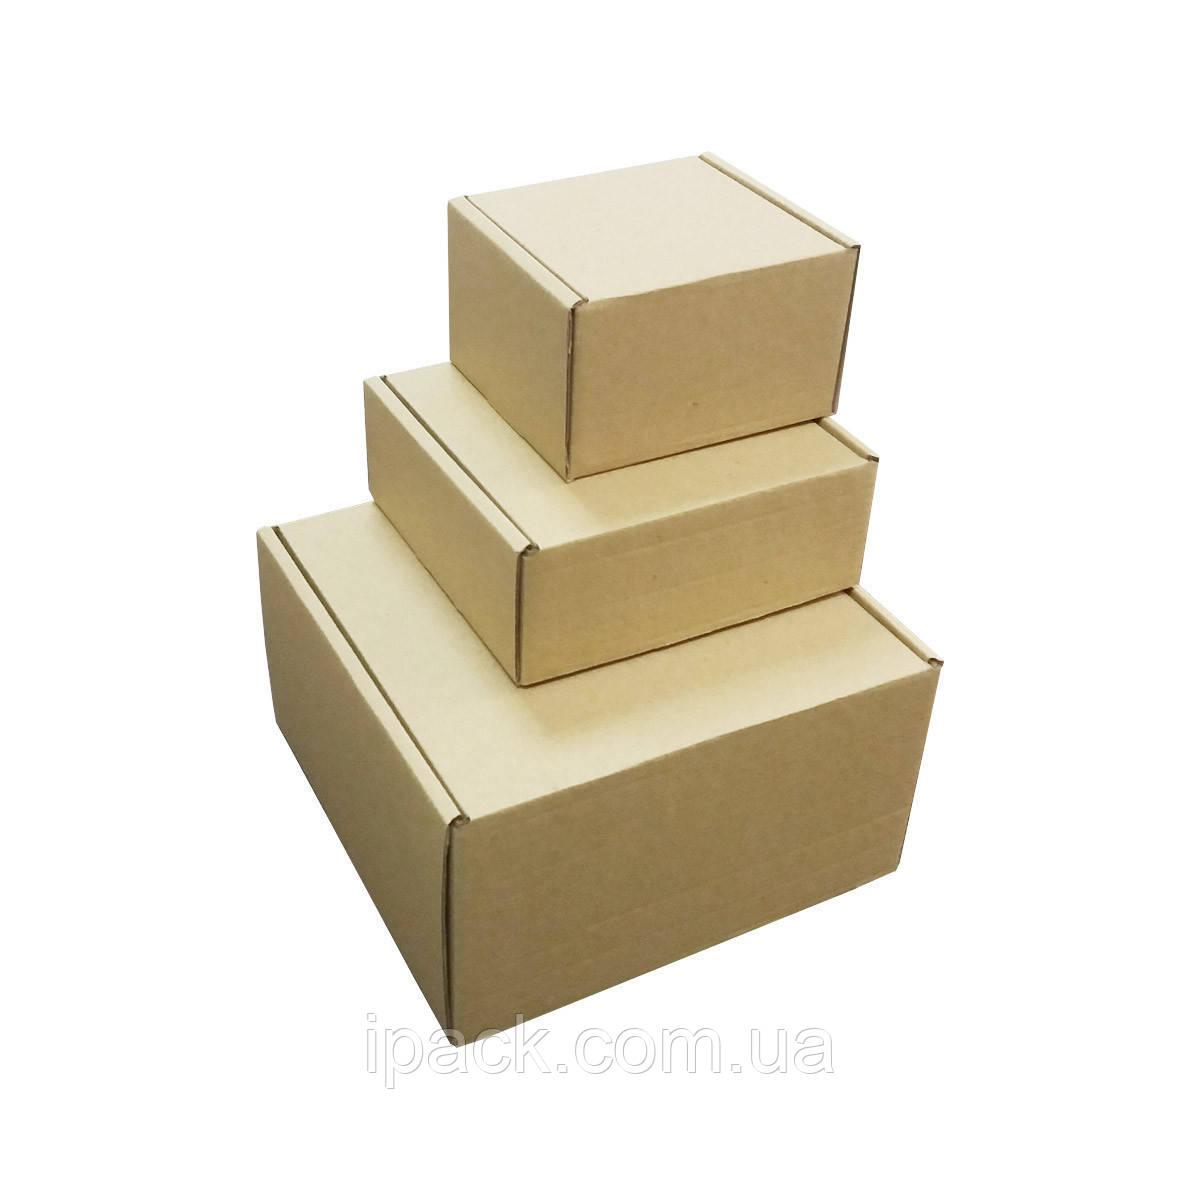 Коробка картонная самосборная, 200*200*350, мм, бурая, крафт, микрогофрокартон